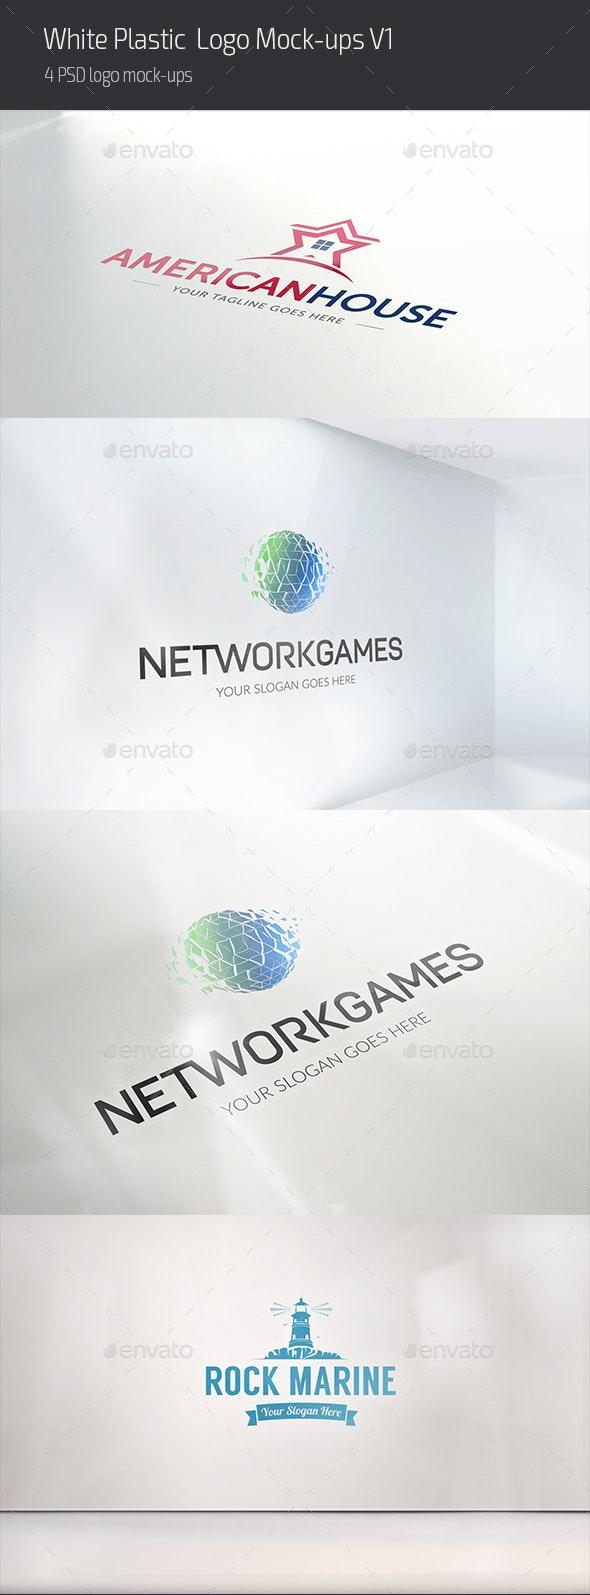 White Plastic Logo Mock-ups V1 - Logo Product Mock-Ups